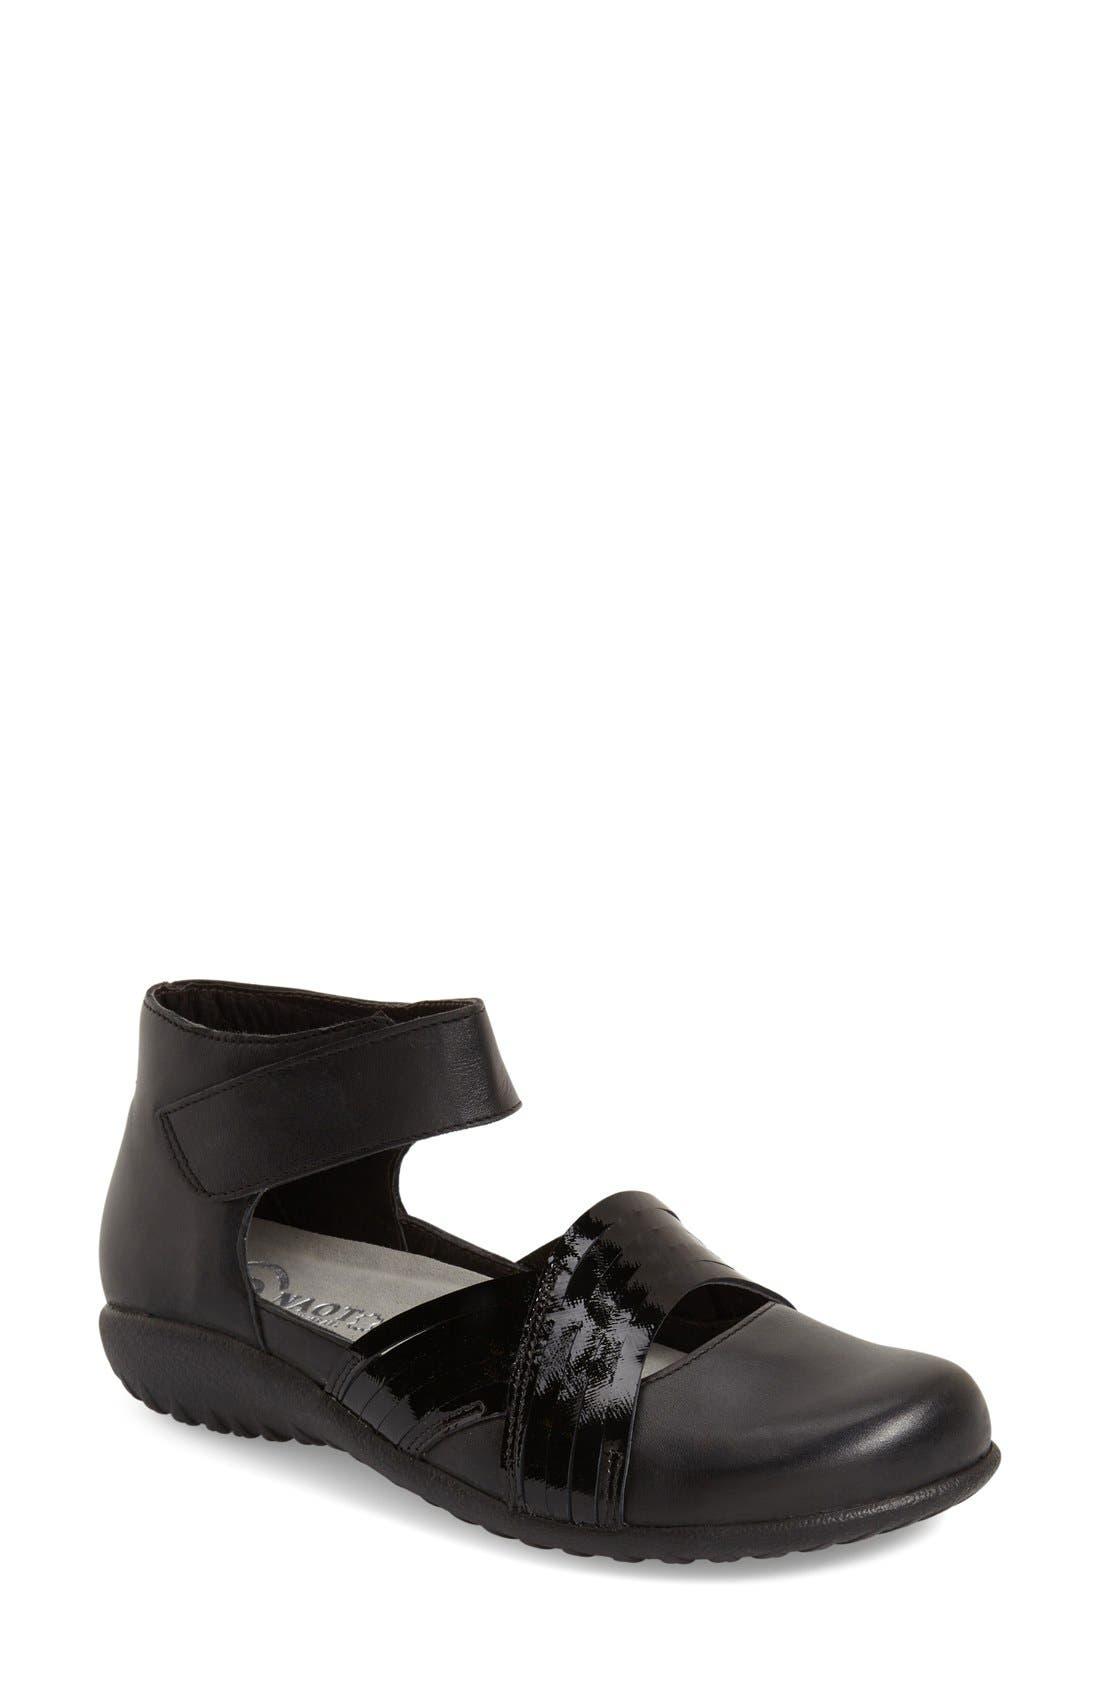 'Tenei' Ankle Strap Flat,                             Main thumbnail 1, color,                             BLACK RAVEN LEATHER